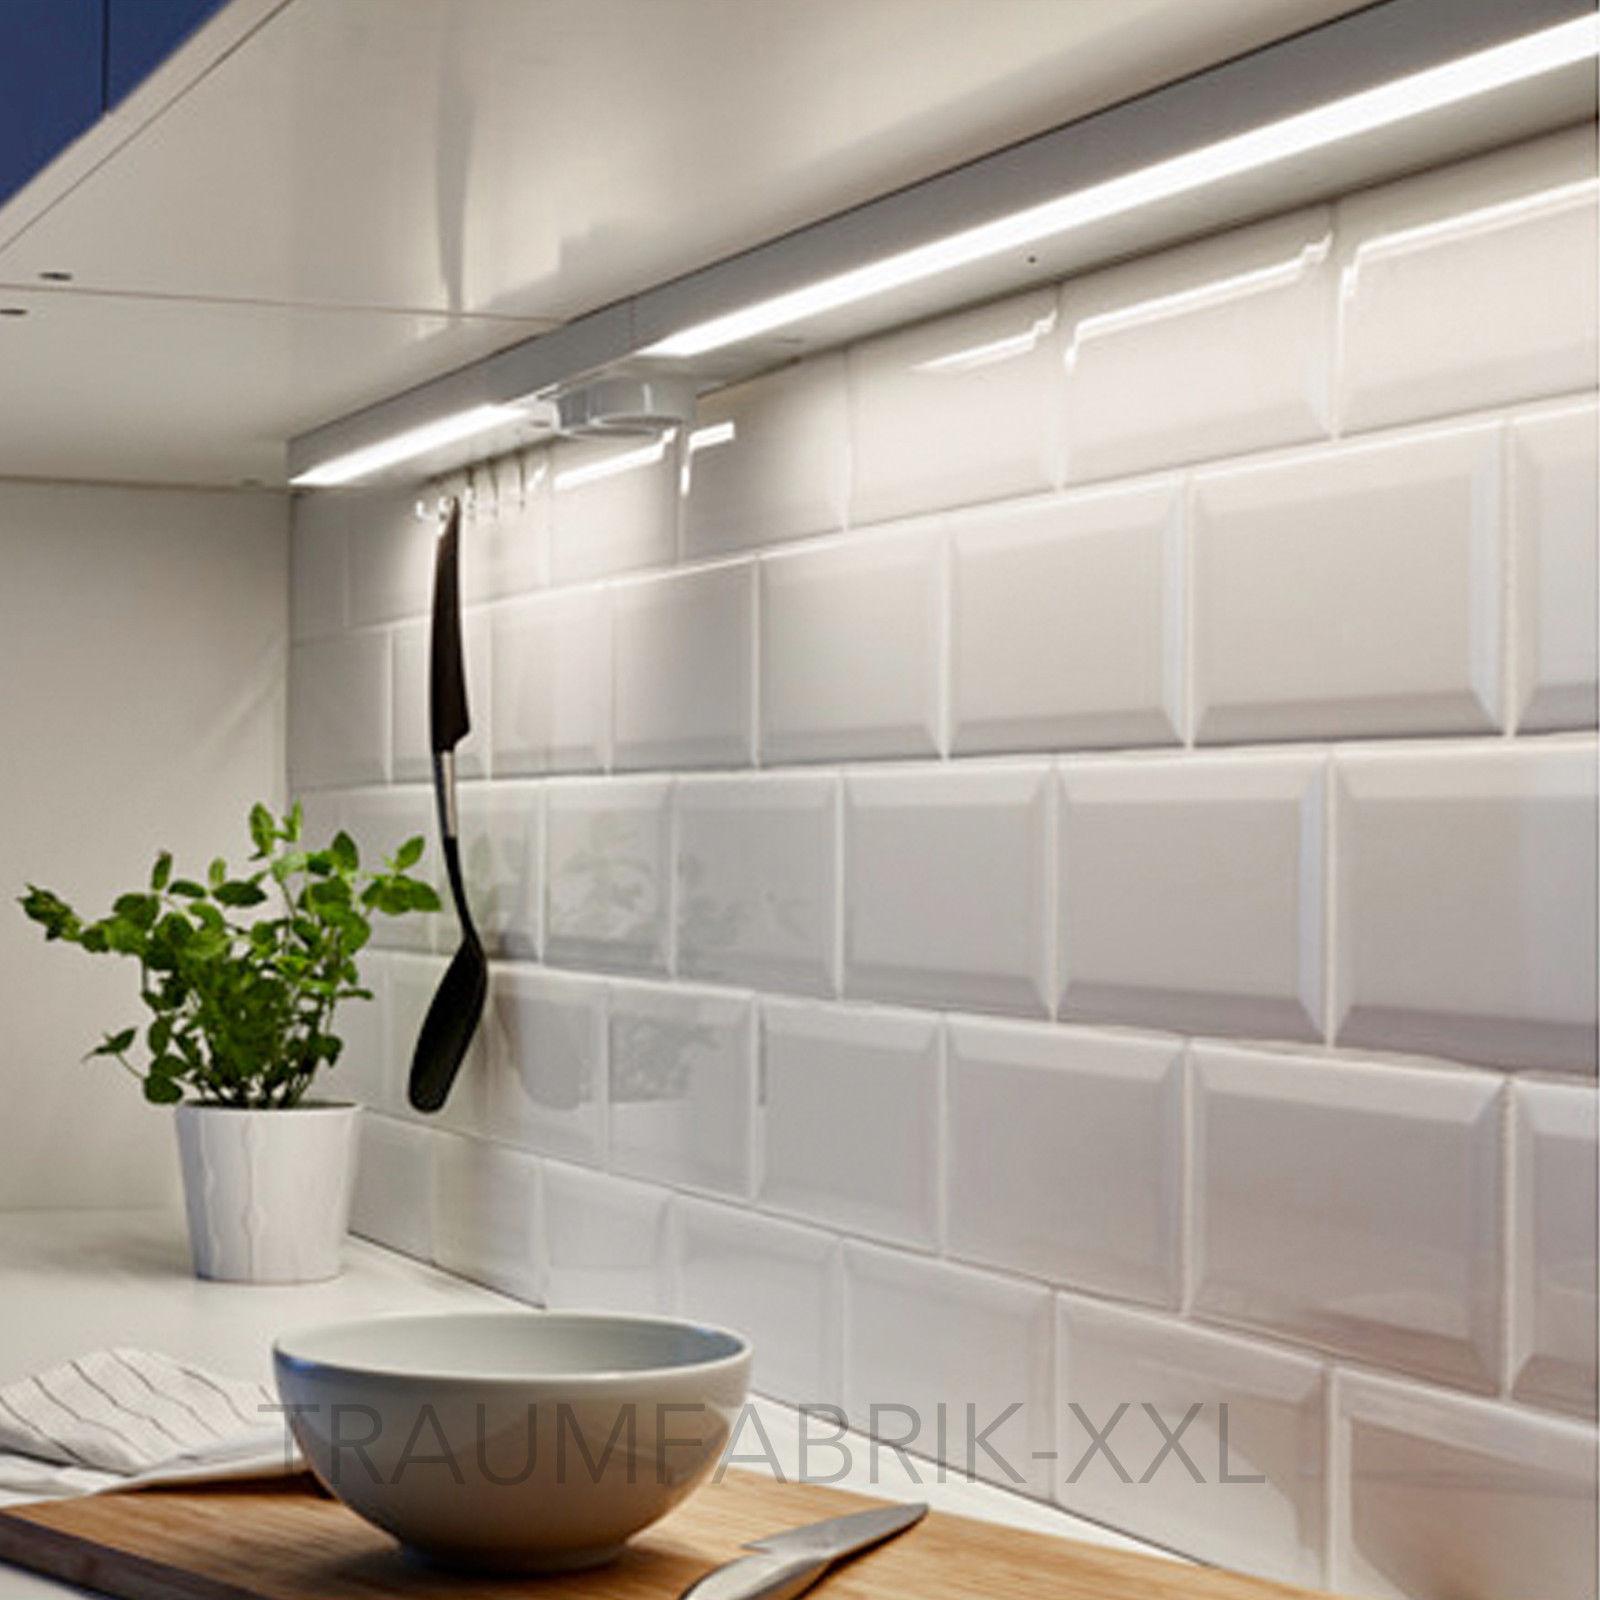 IKEA UTRUSTA Lichtleiste Arbeitsleuchte Küchen LED Beleuchtung 80cm Dimmbar  NEU | Traumfabrik XXL